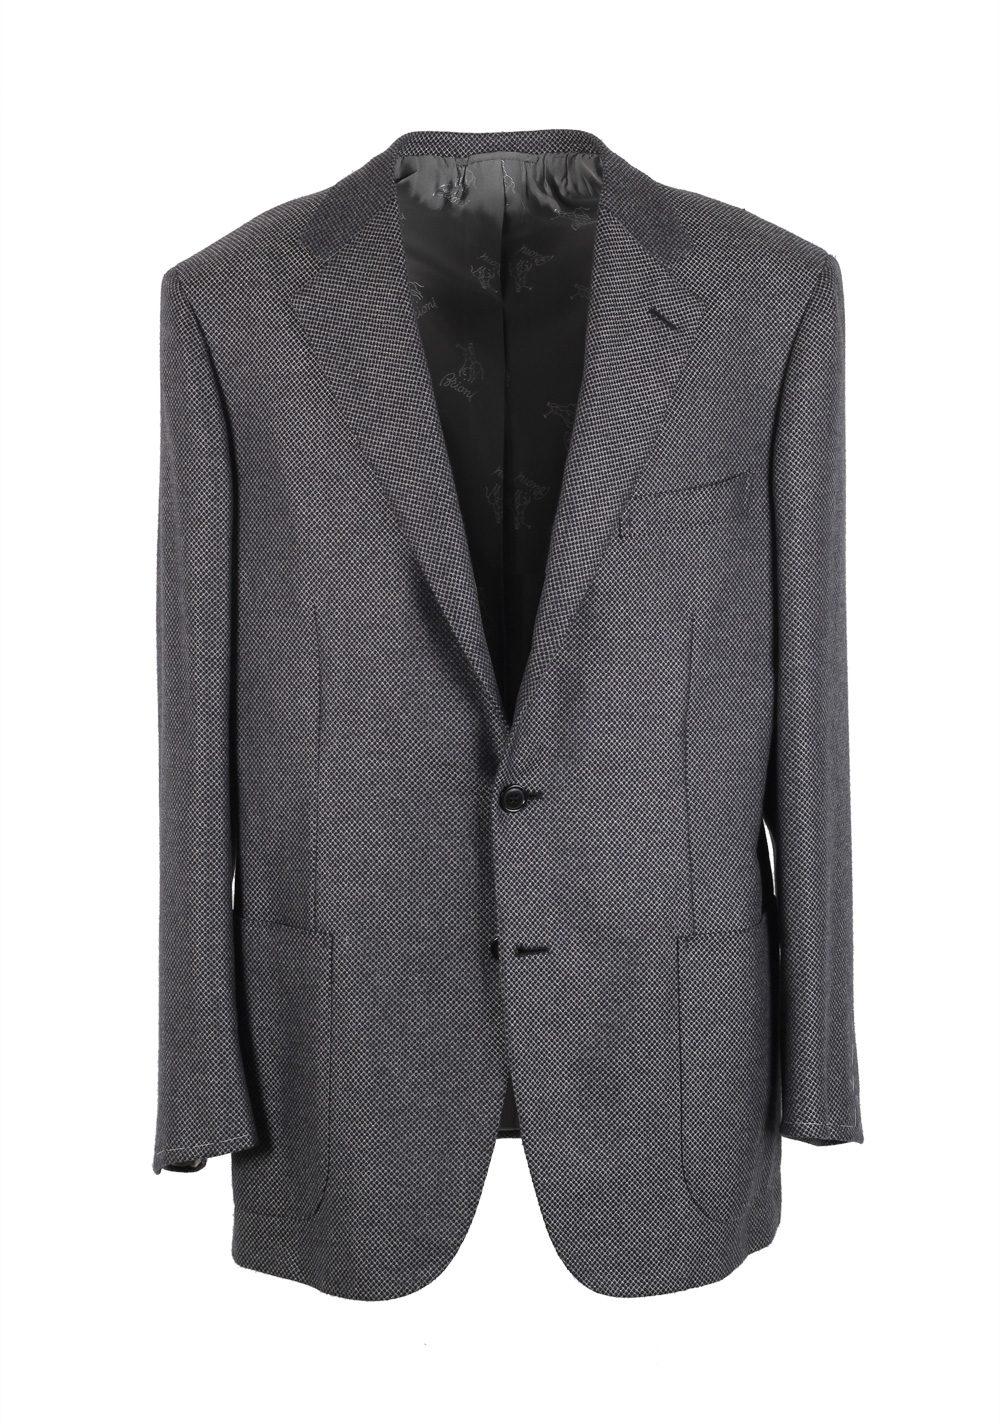 Brioni Parlamento Sport Coat Size 52 / 42R U.S. Cashmere Silk | Costume Limité